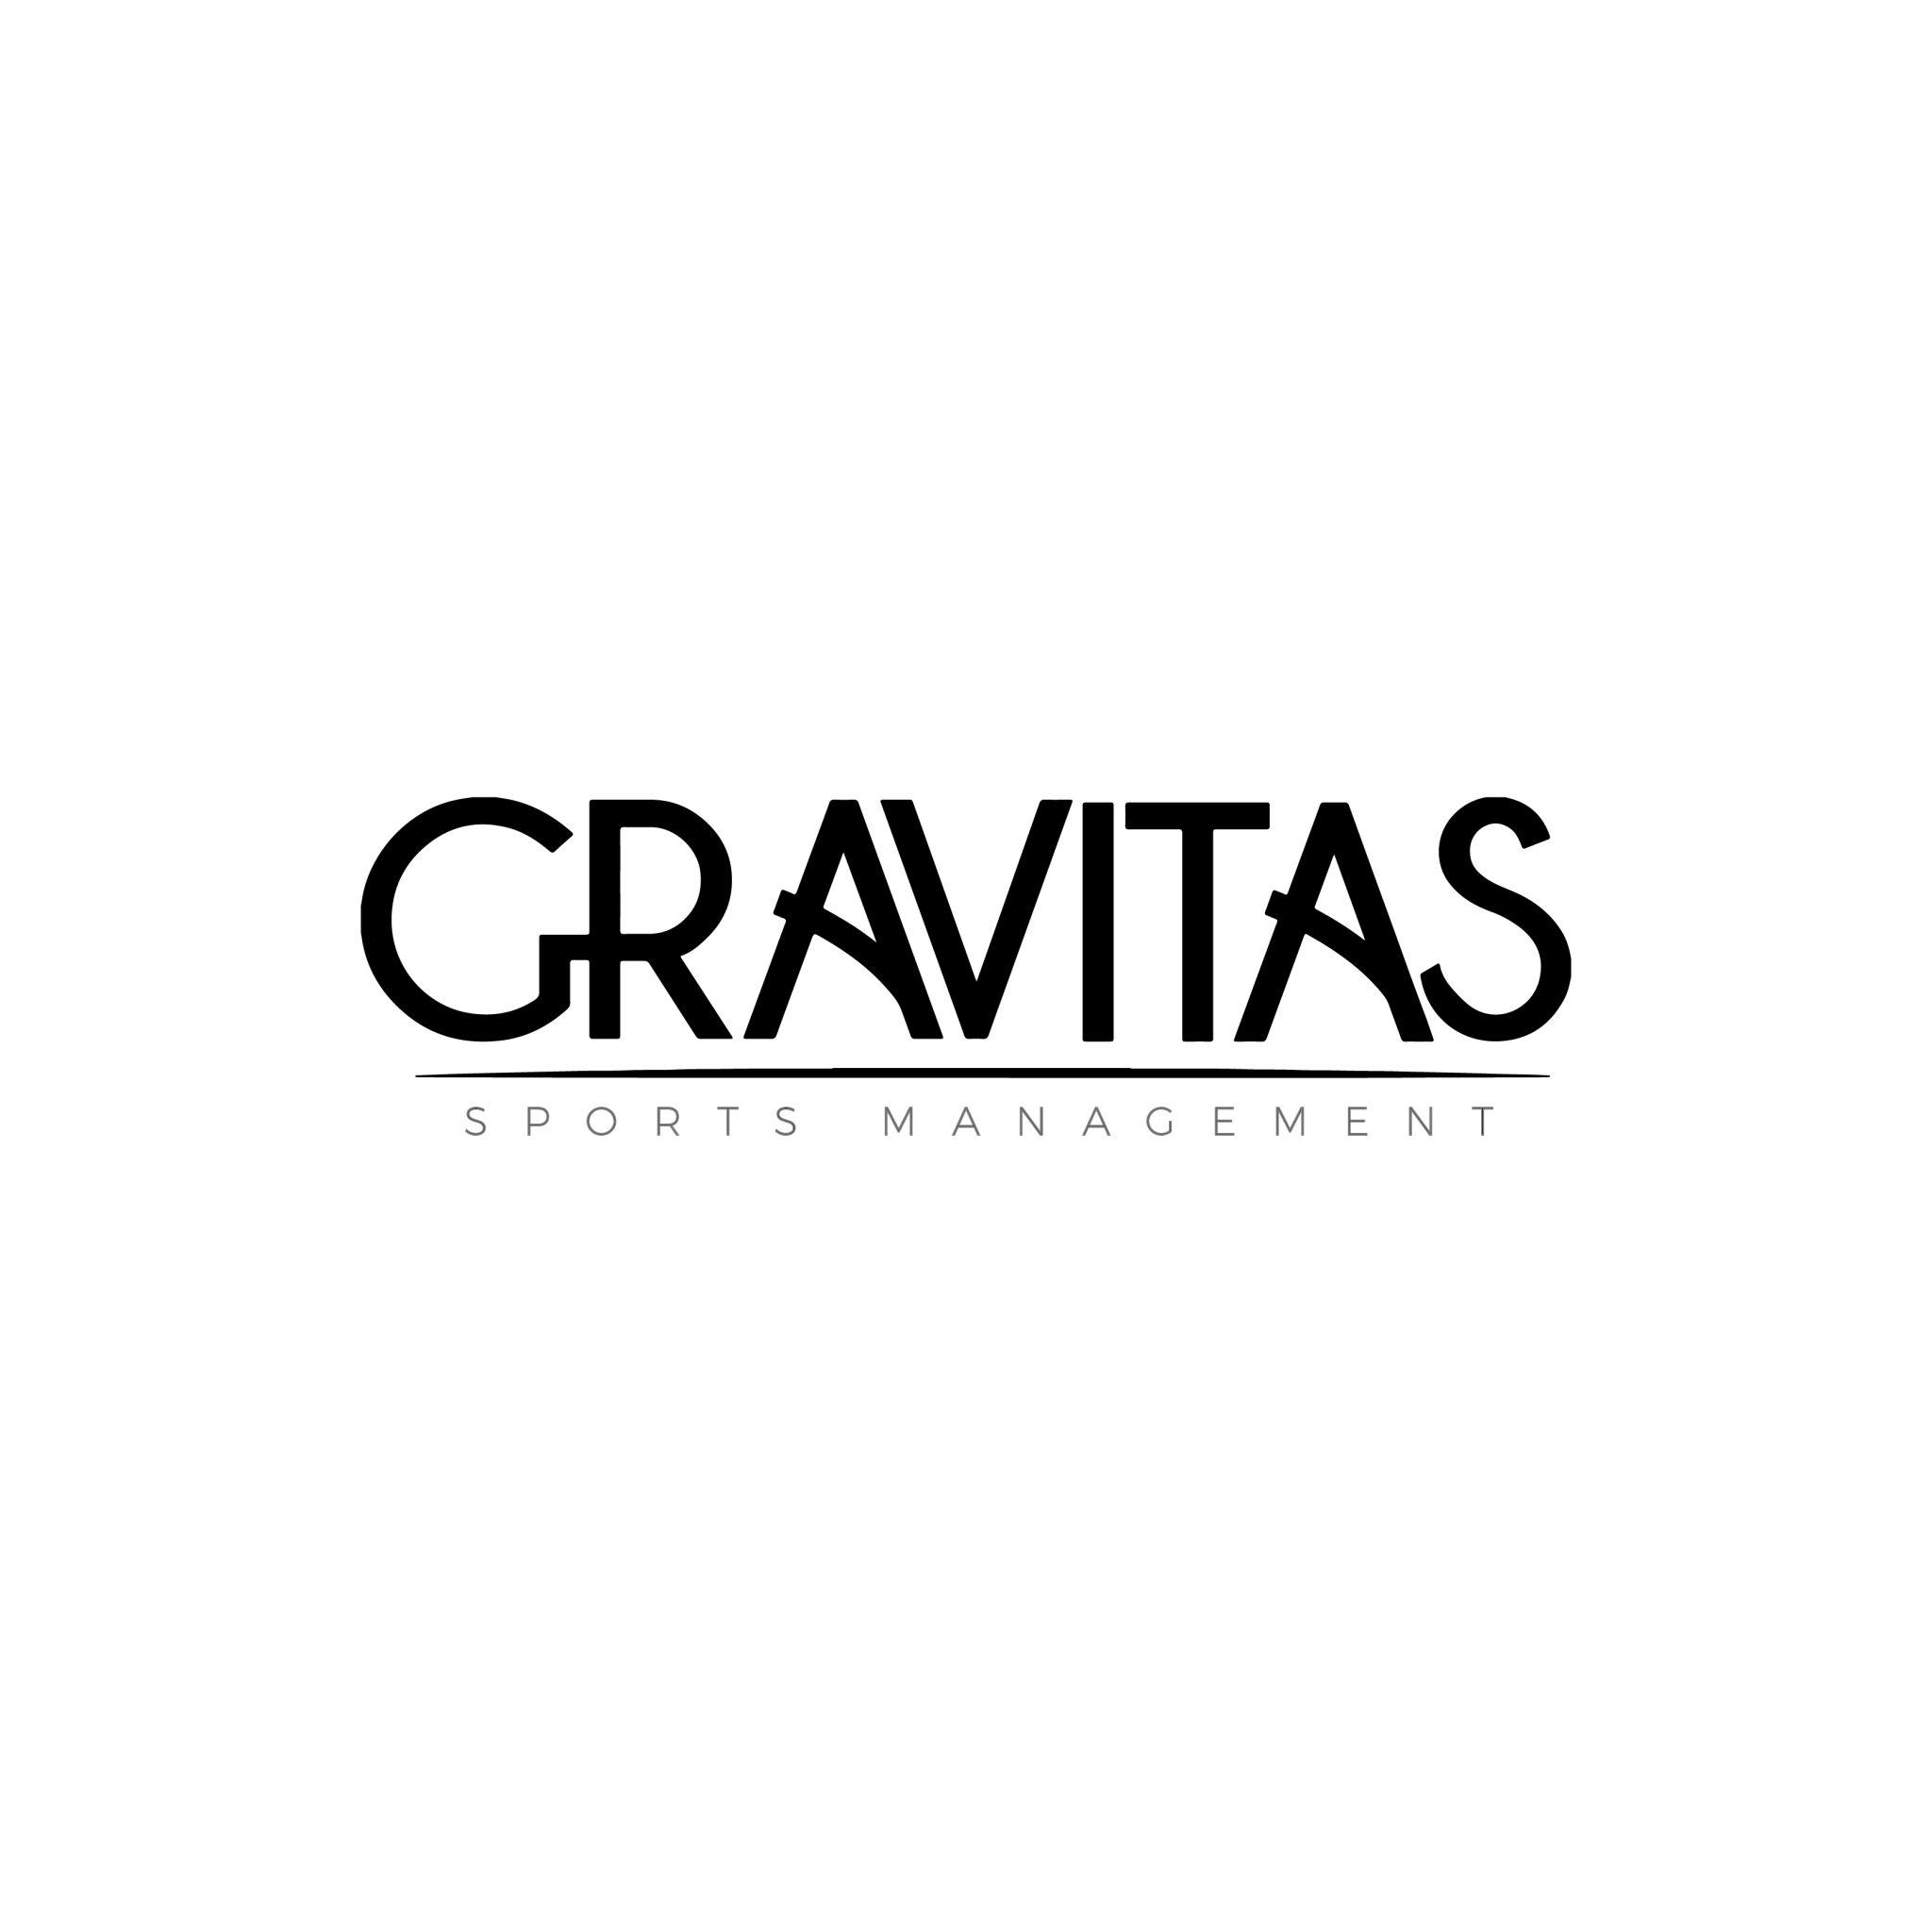 Gravitas Sports Management